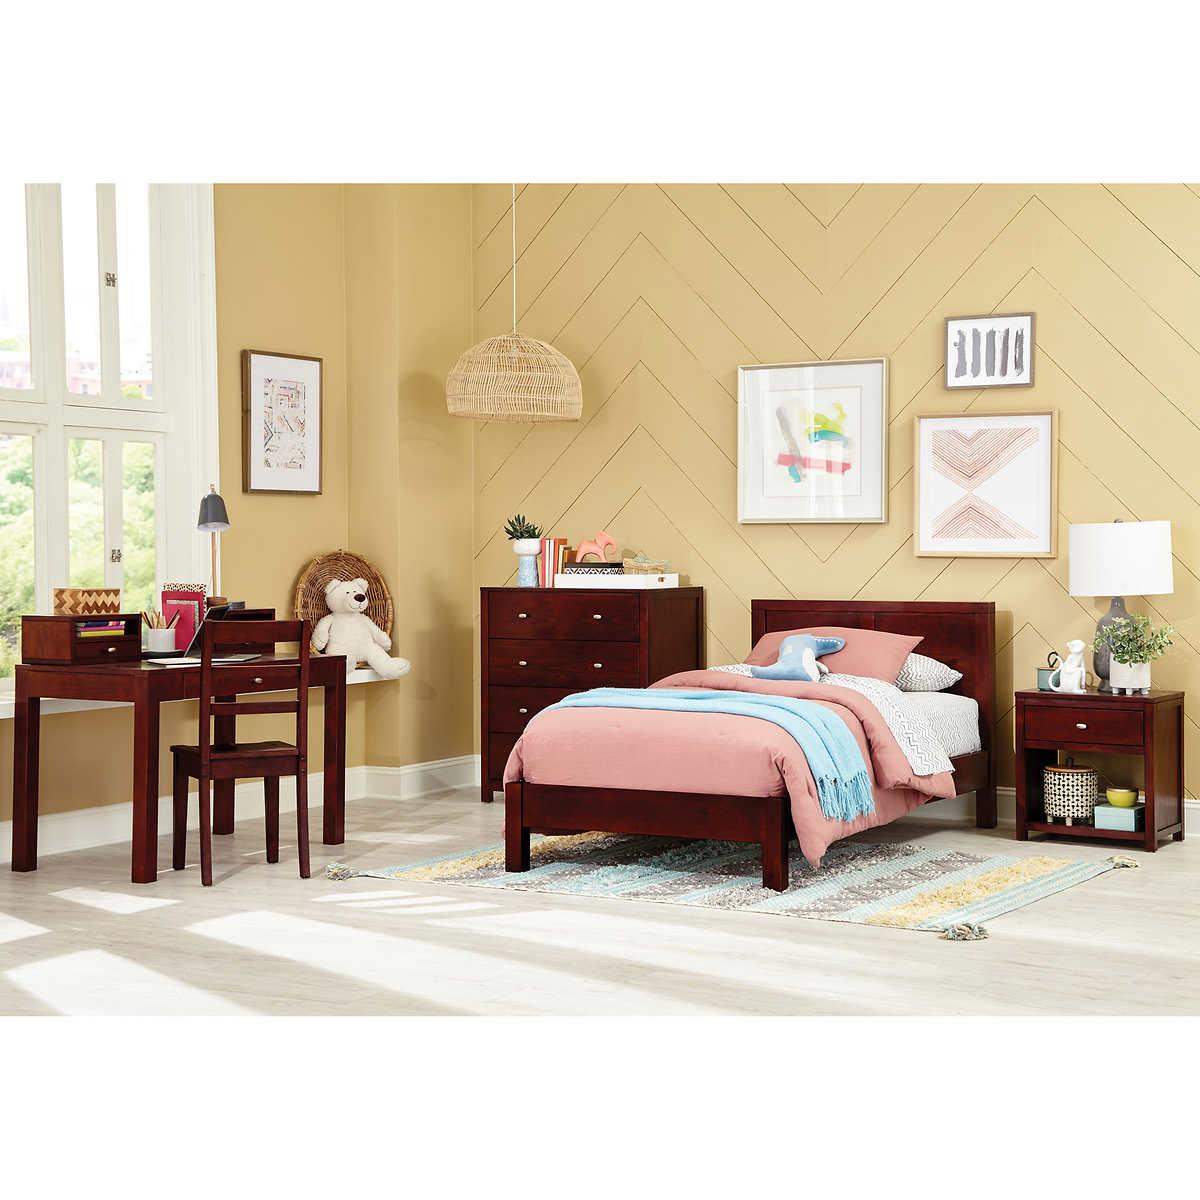 Modeno 4 Piece Twin Bed Set